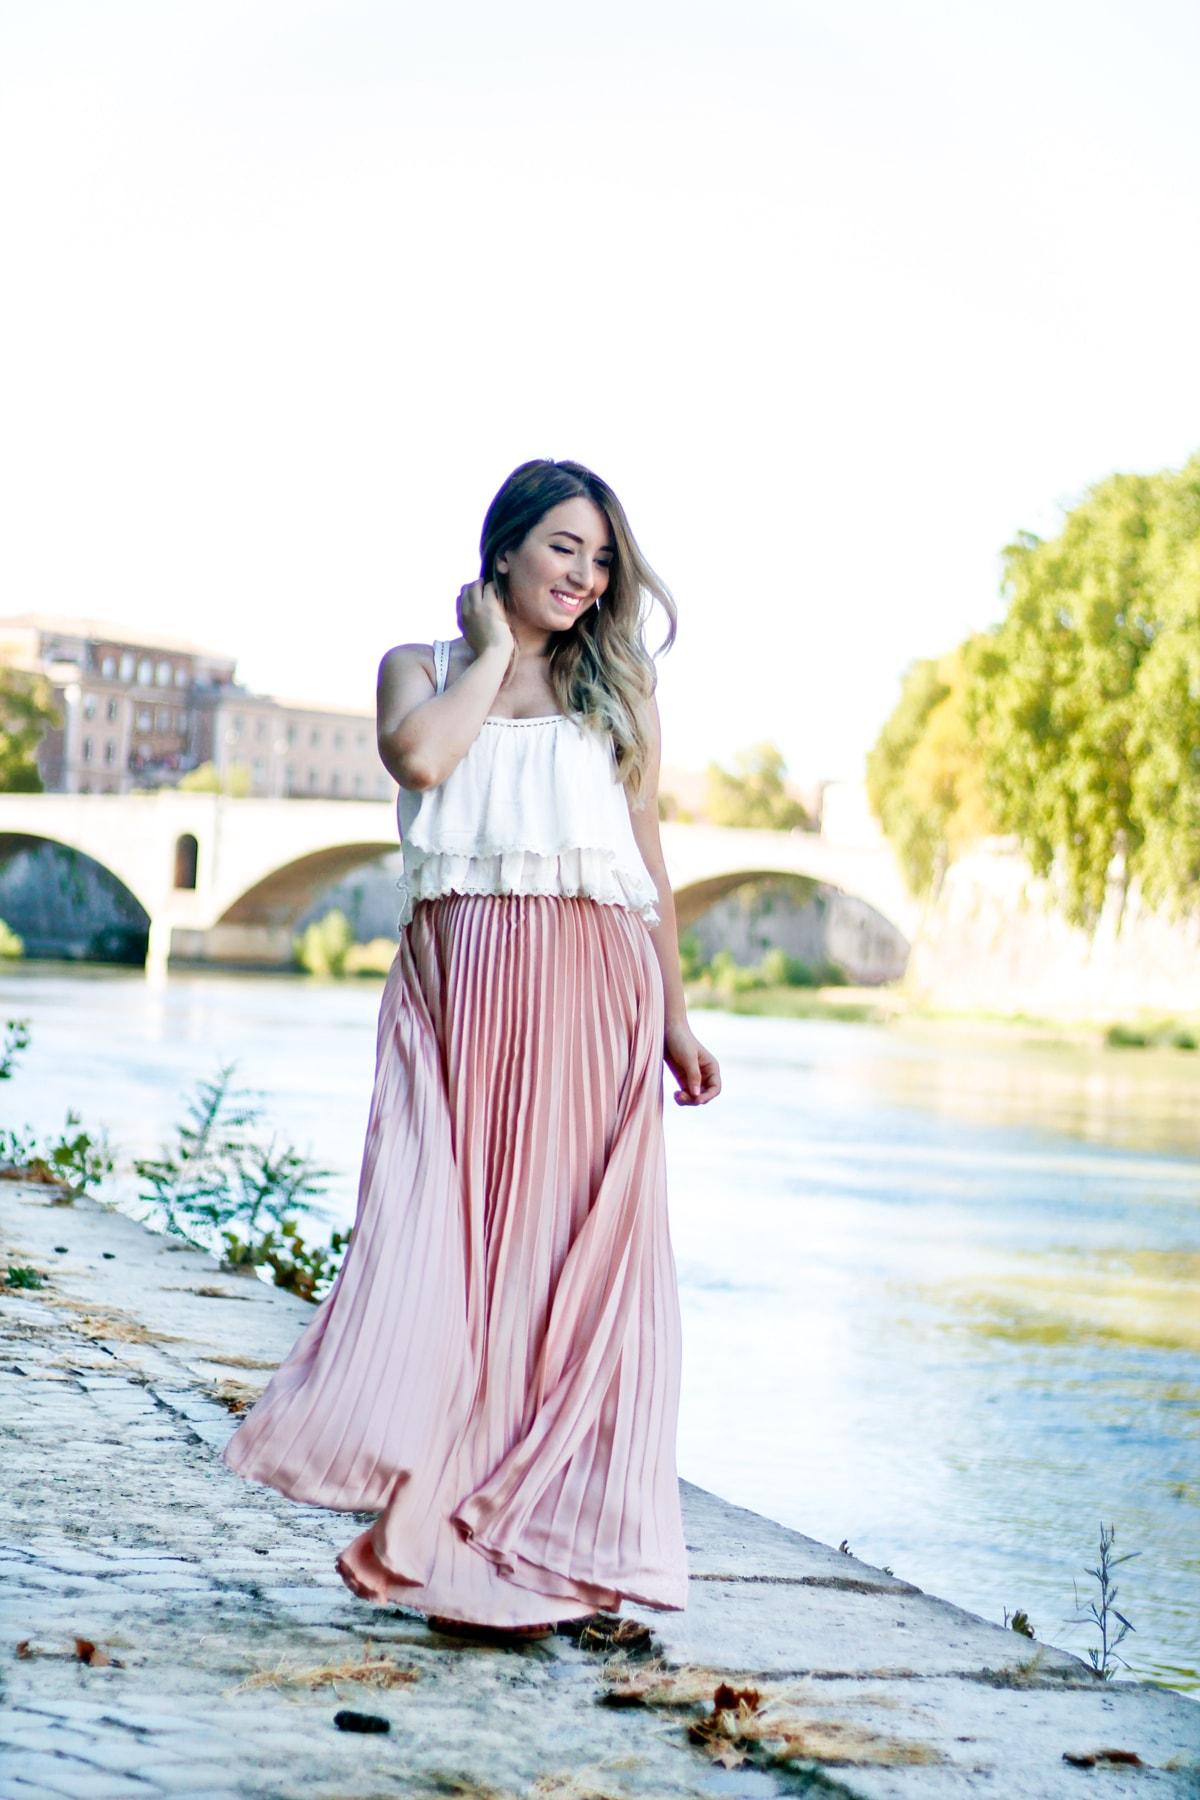 Andreea Ristea - Tiber river, tevere, tibru, roma, rome, travel blogger outfit